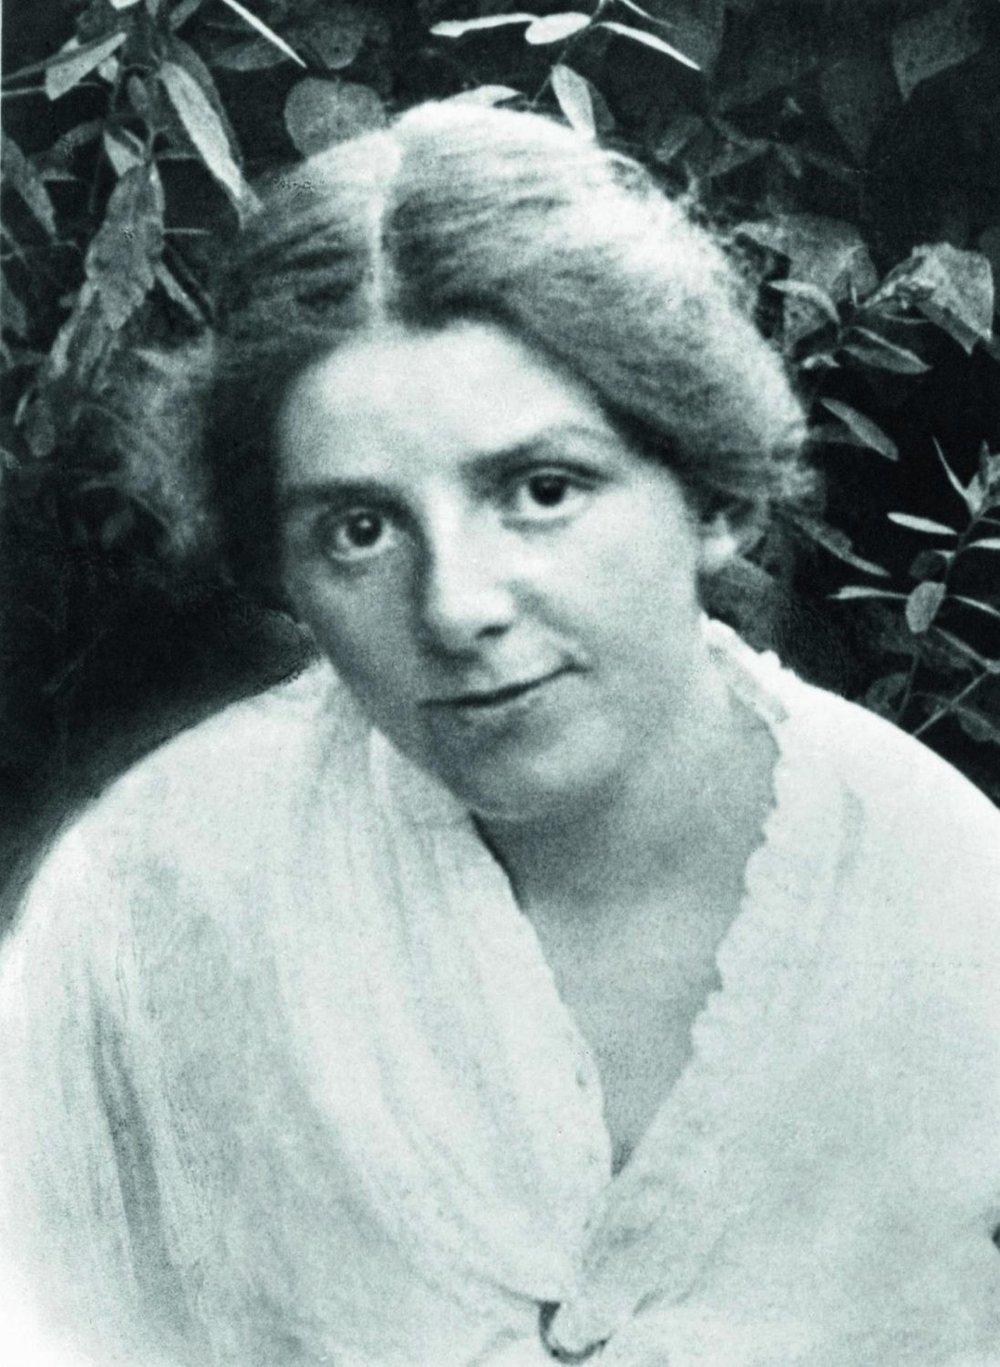 Paula Modersohn-Becker Born: February 8, 1876 Died: November 21, 1907